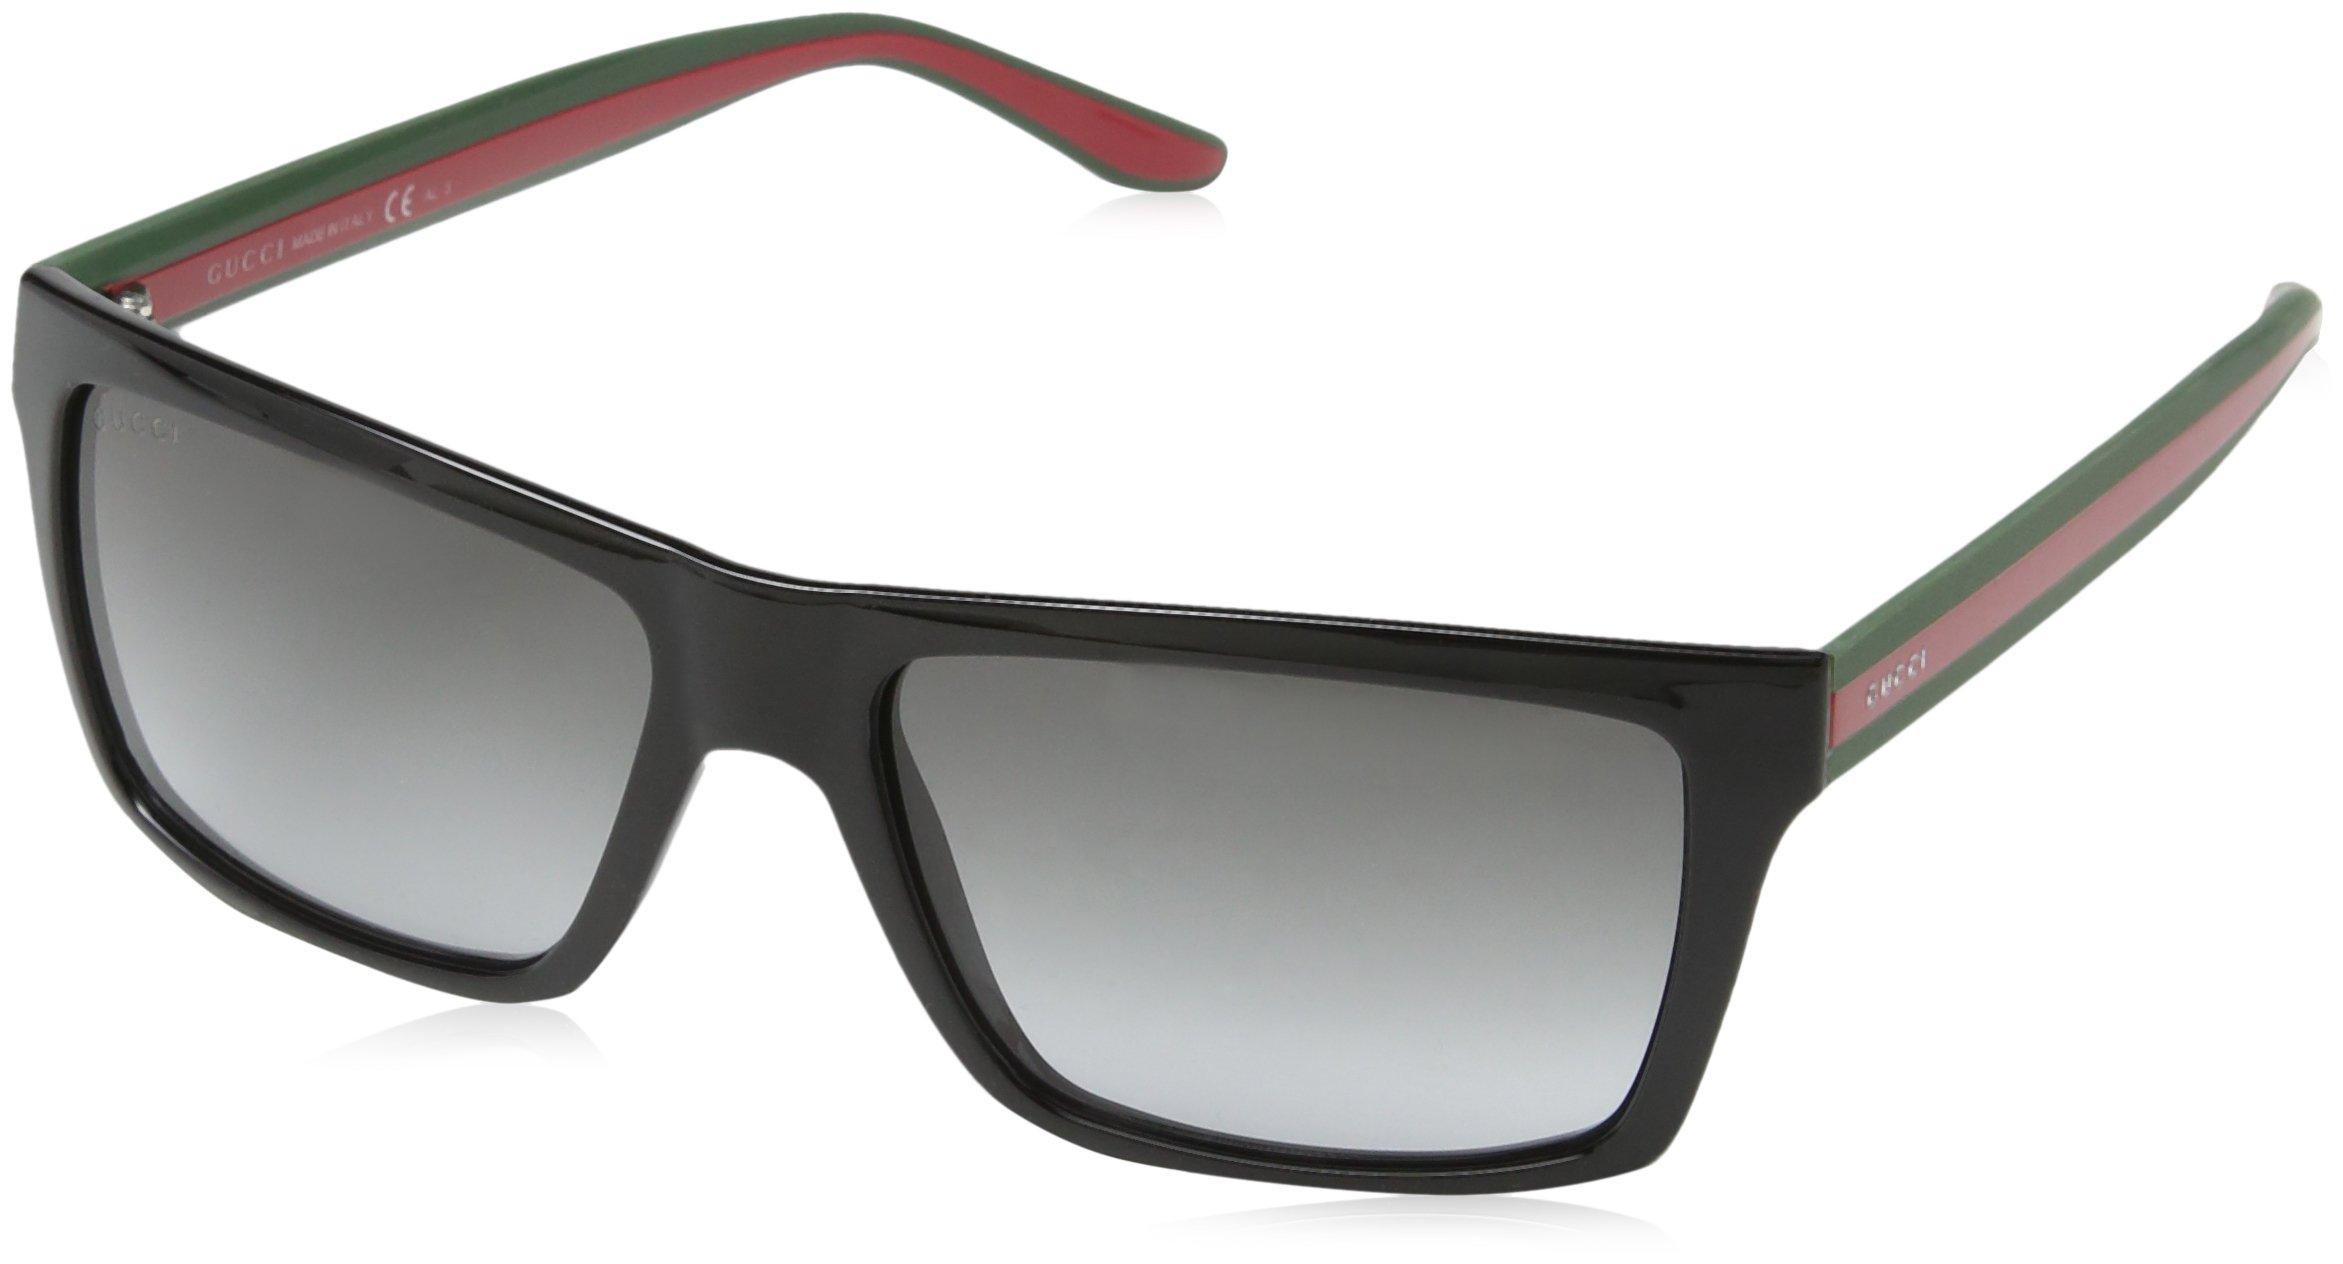 Gucci Men's GG 1013/S Shiny Black/Grey Gradient